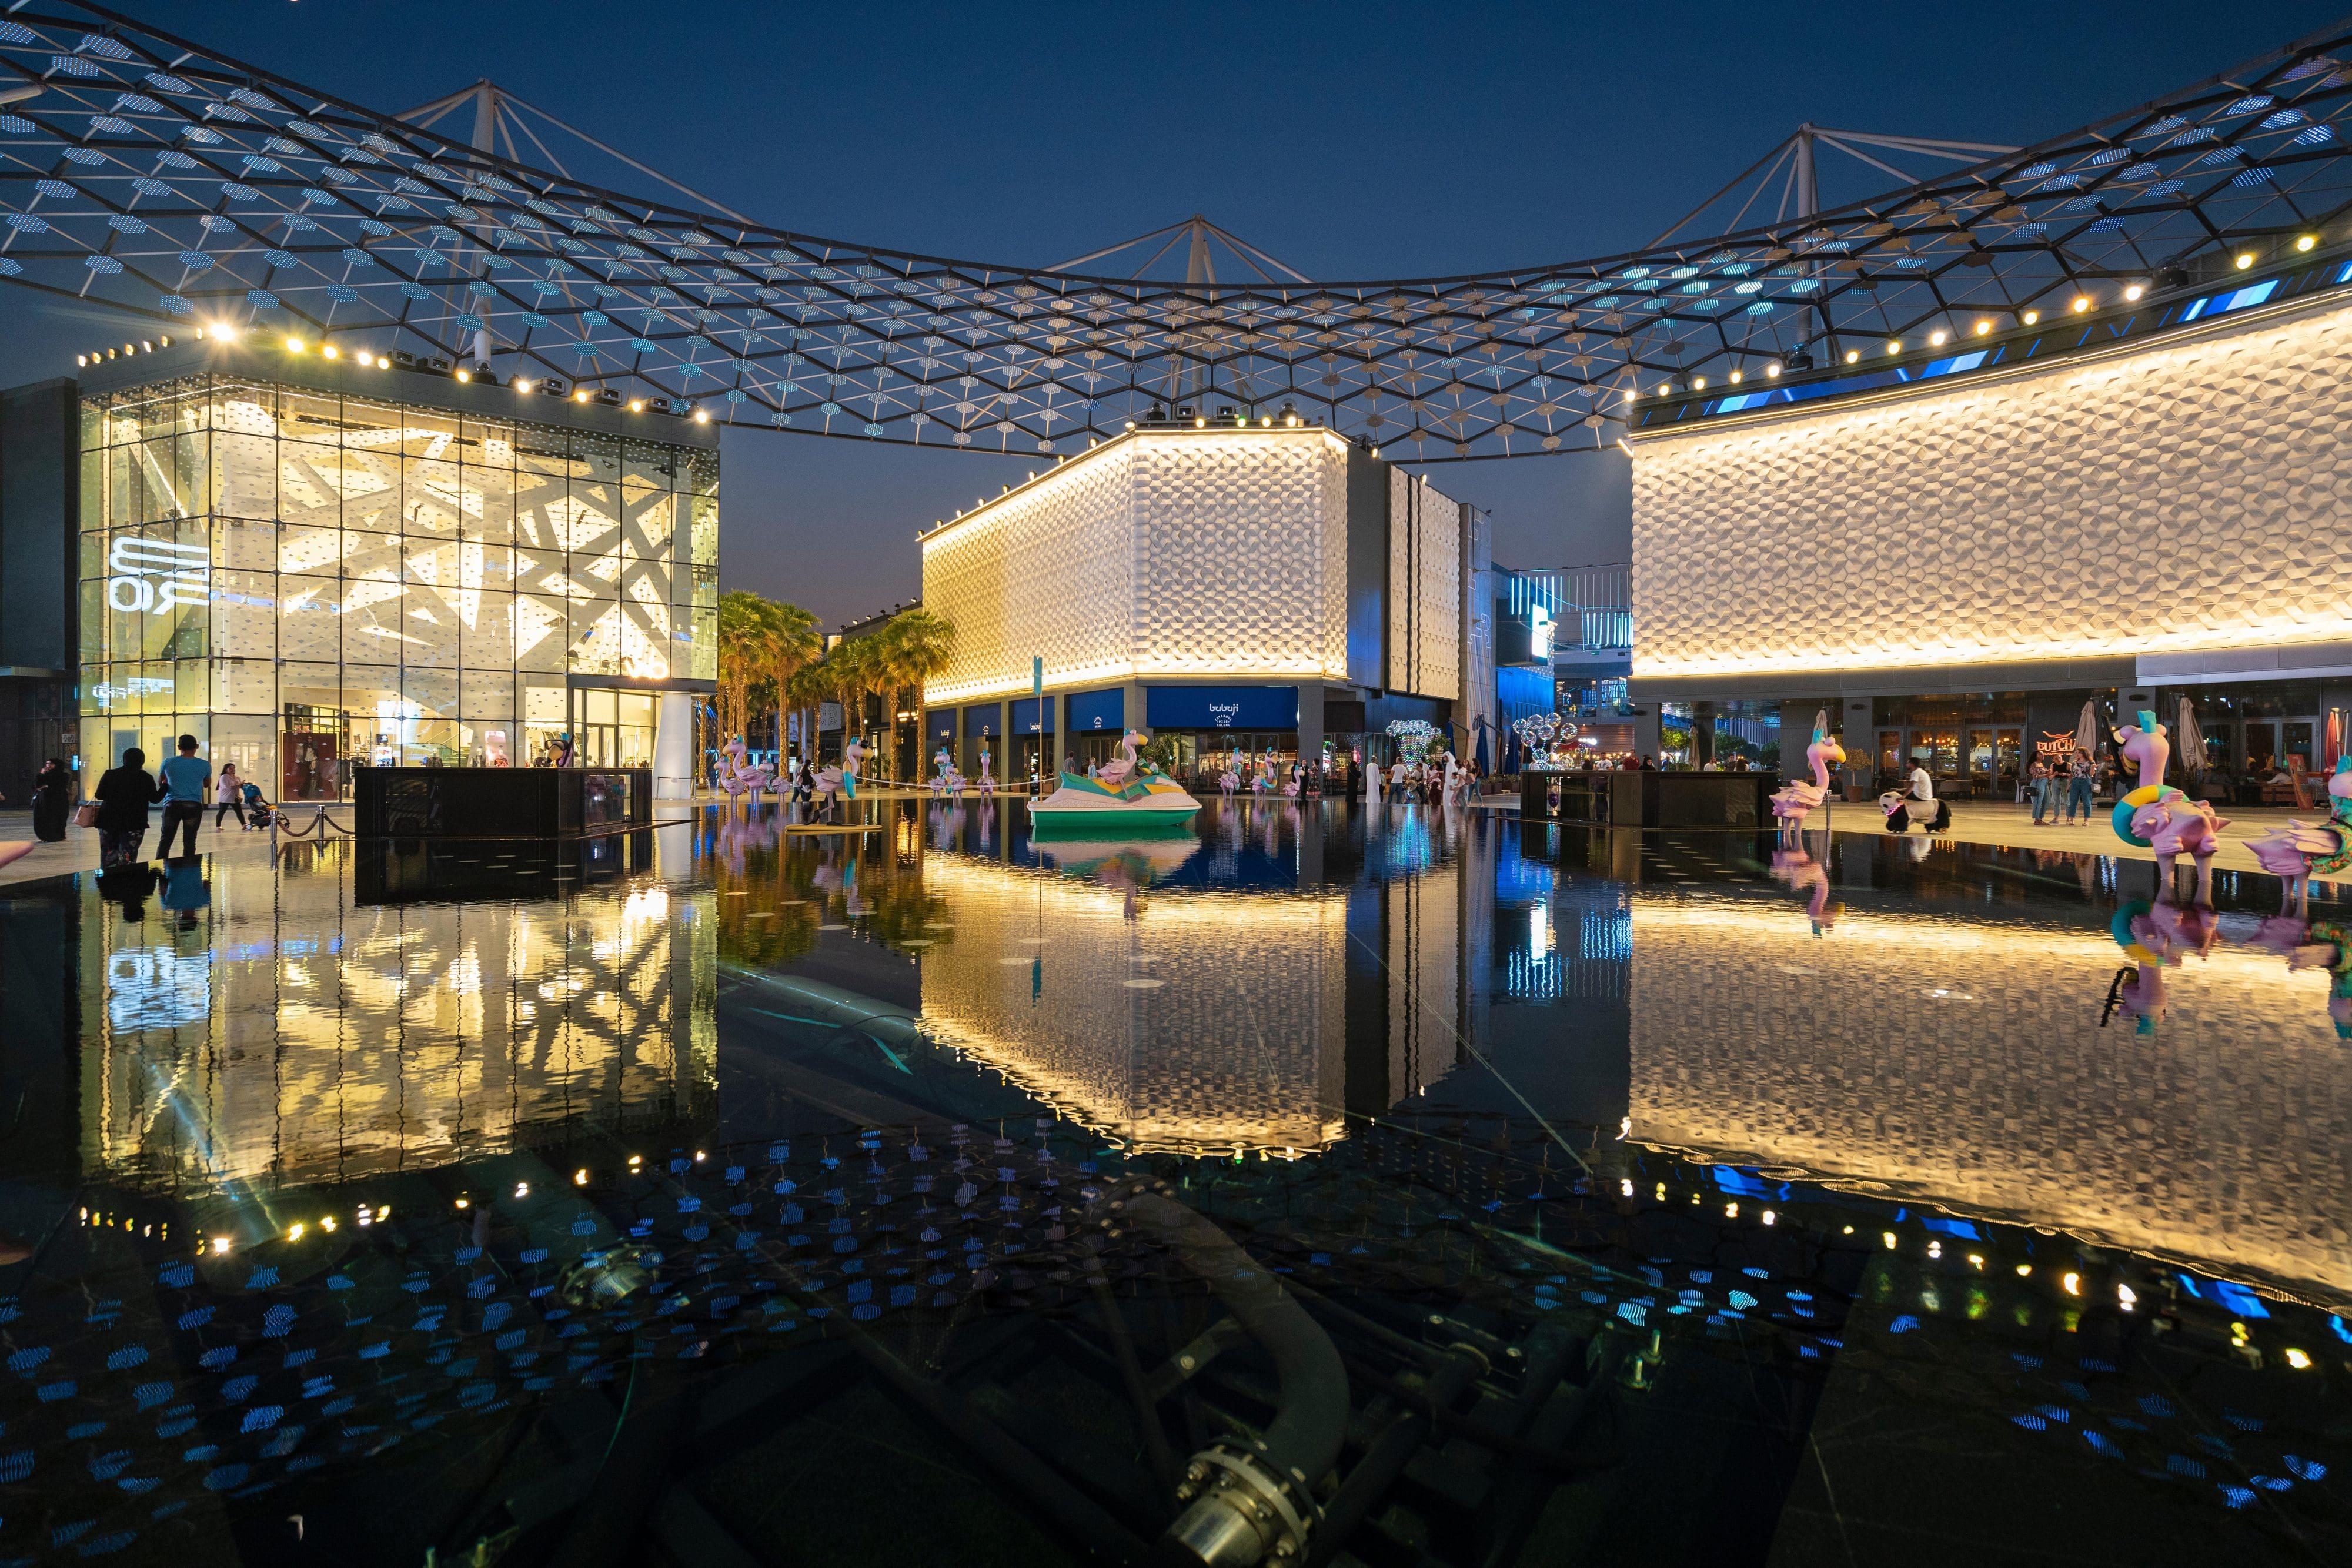 A reflective water feature on Dubai's City Walk